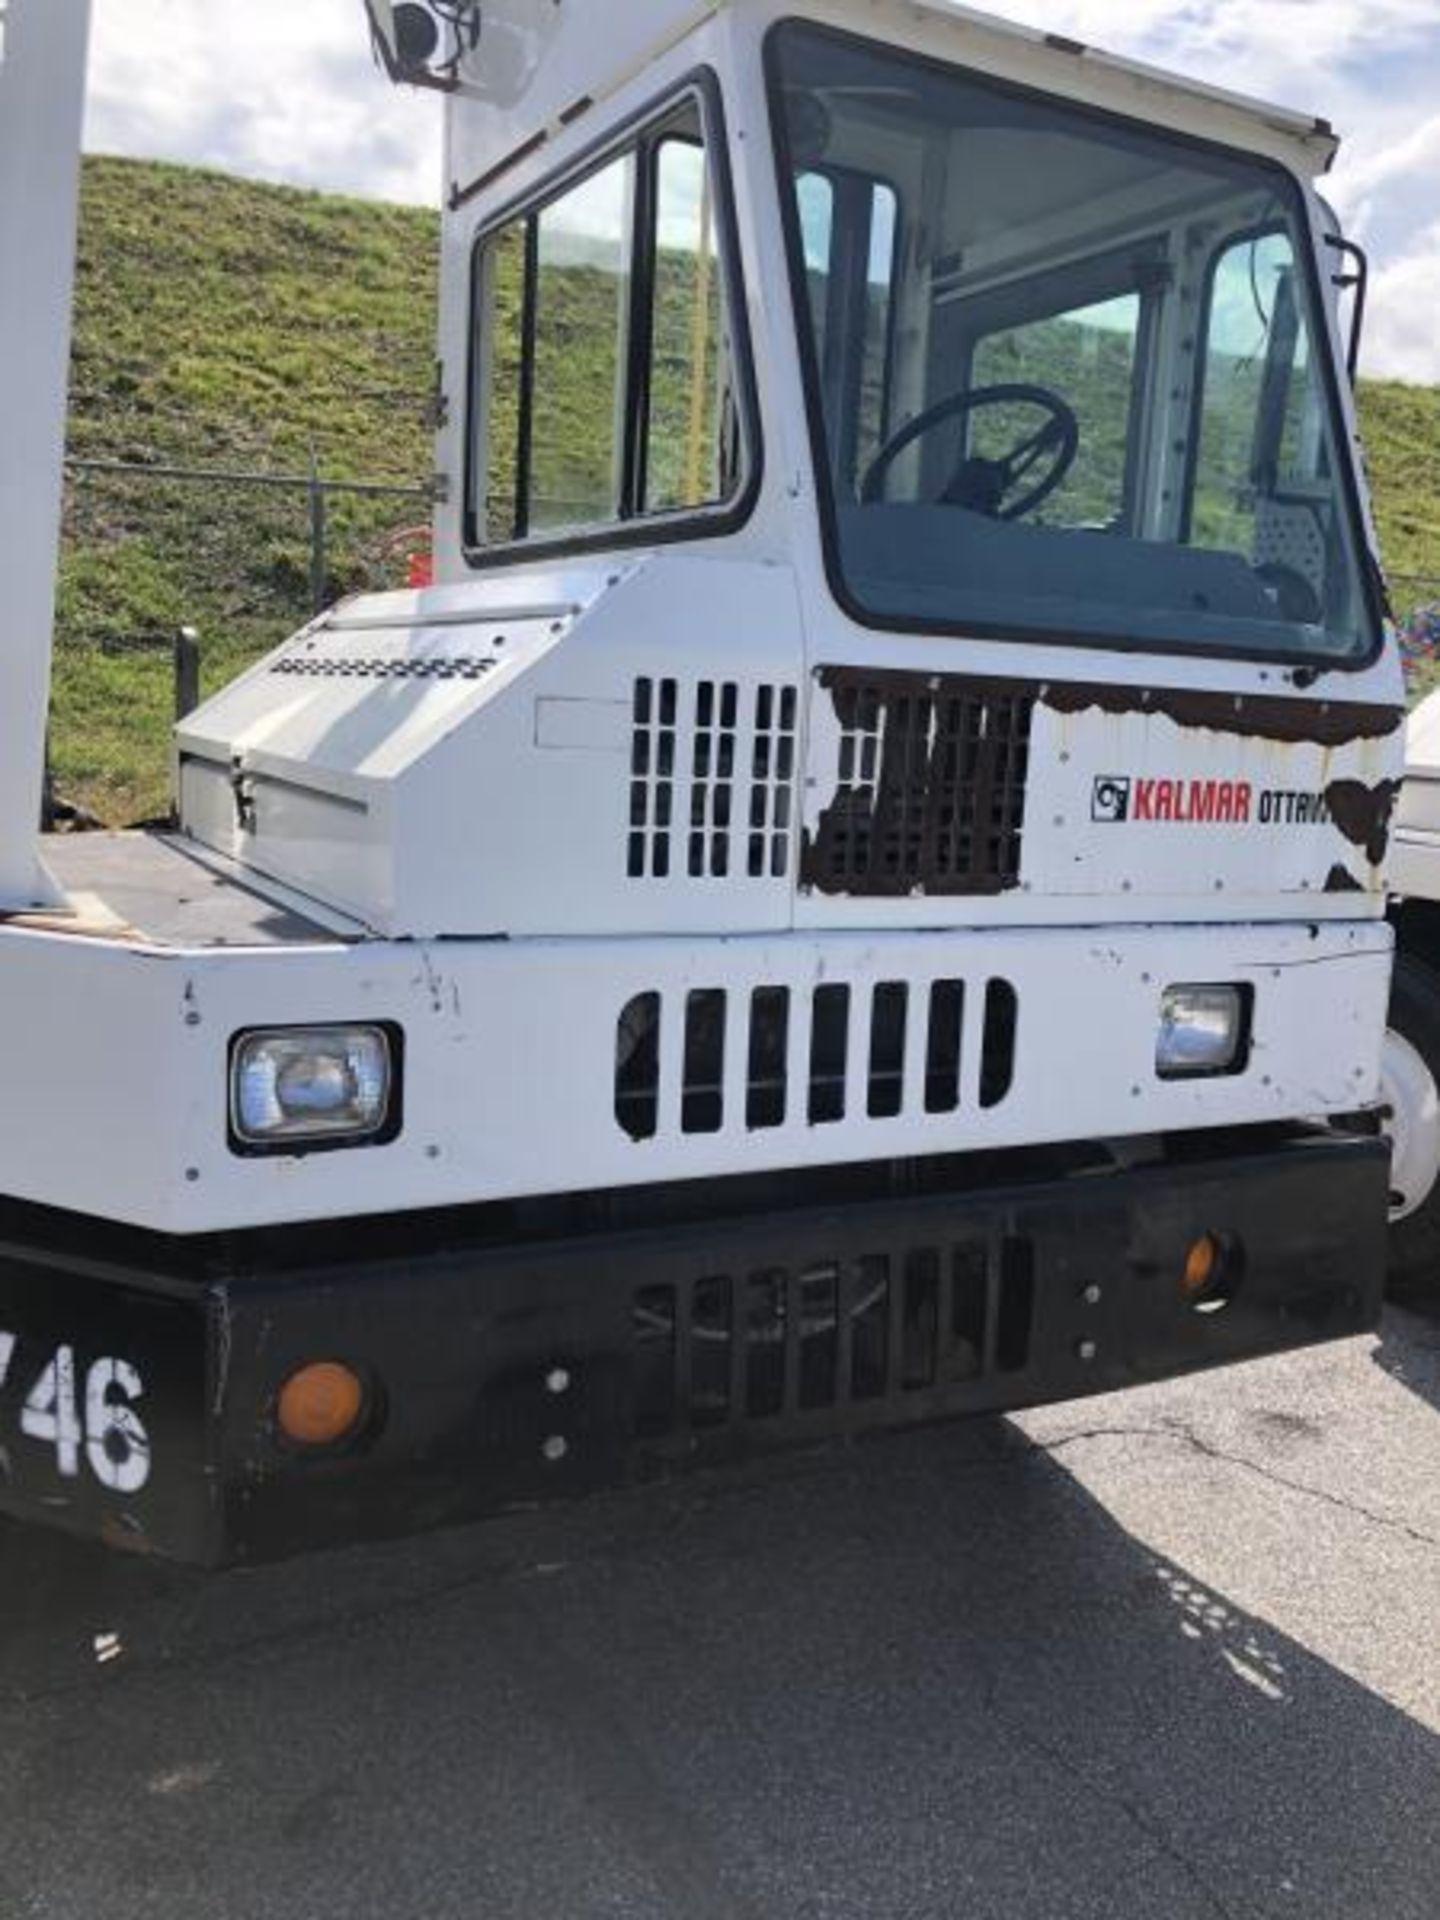 """2015 Kalmar Ottawa 4x2 Yard Truck , SN: 338840 4,378.6 Hours, 1,886 Miles - Image 19 of 36"